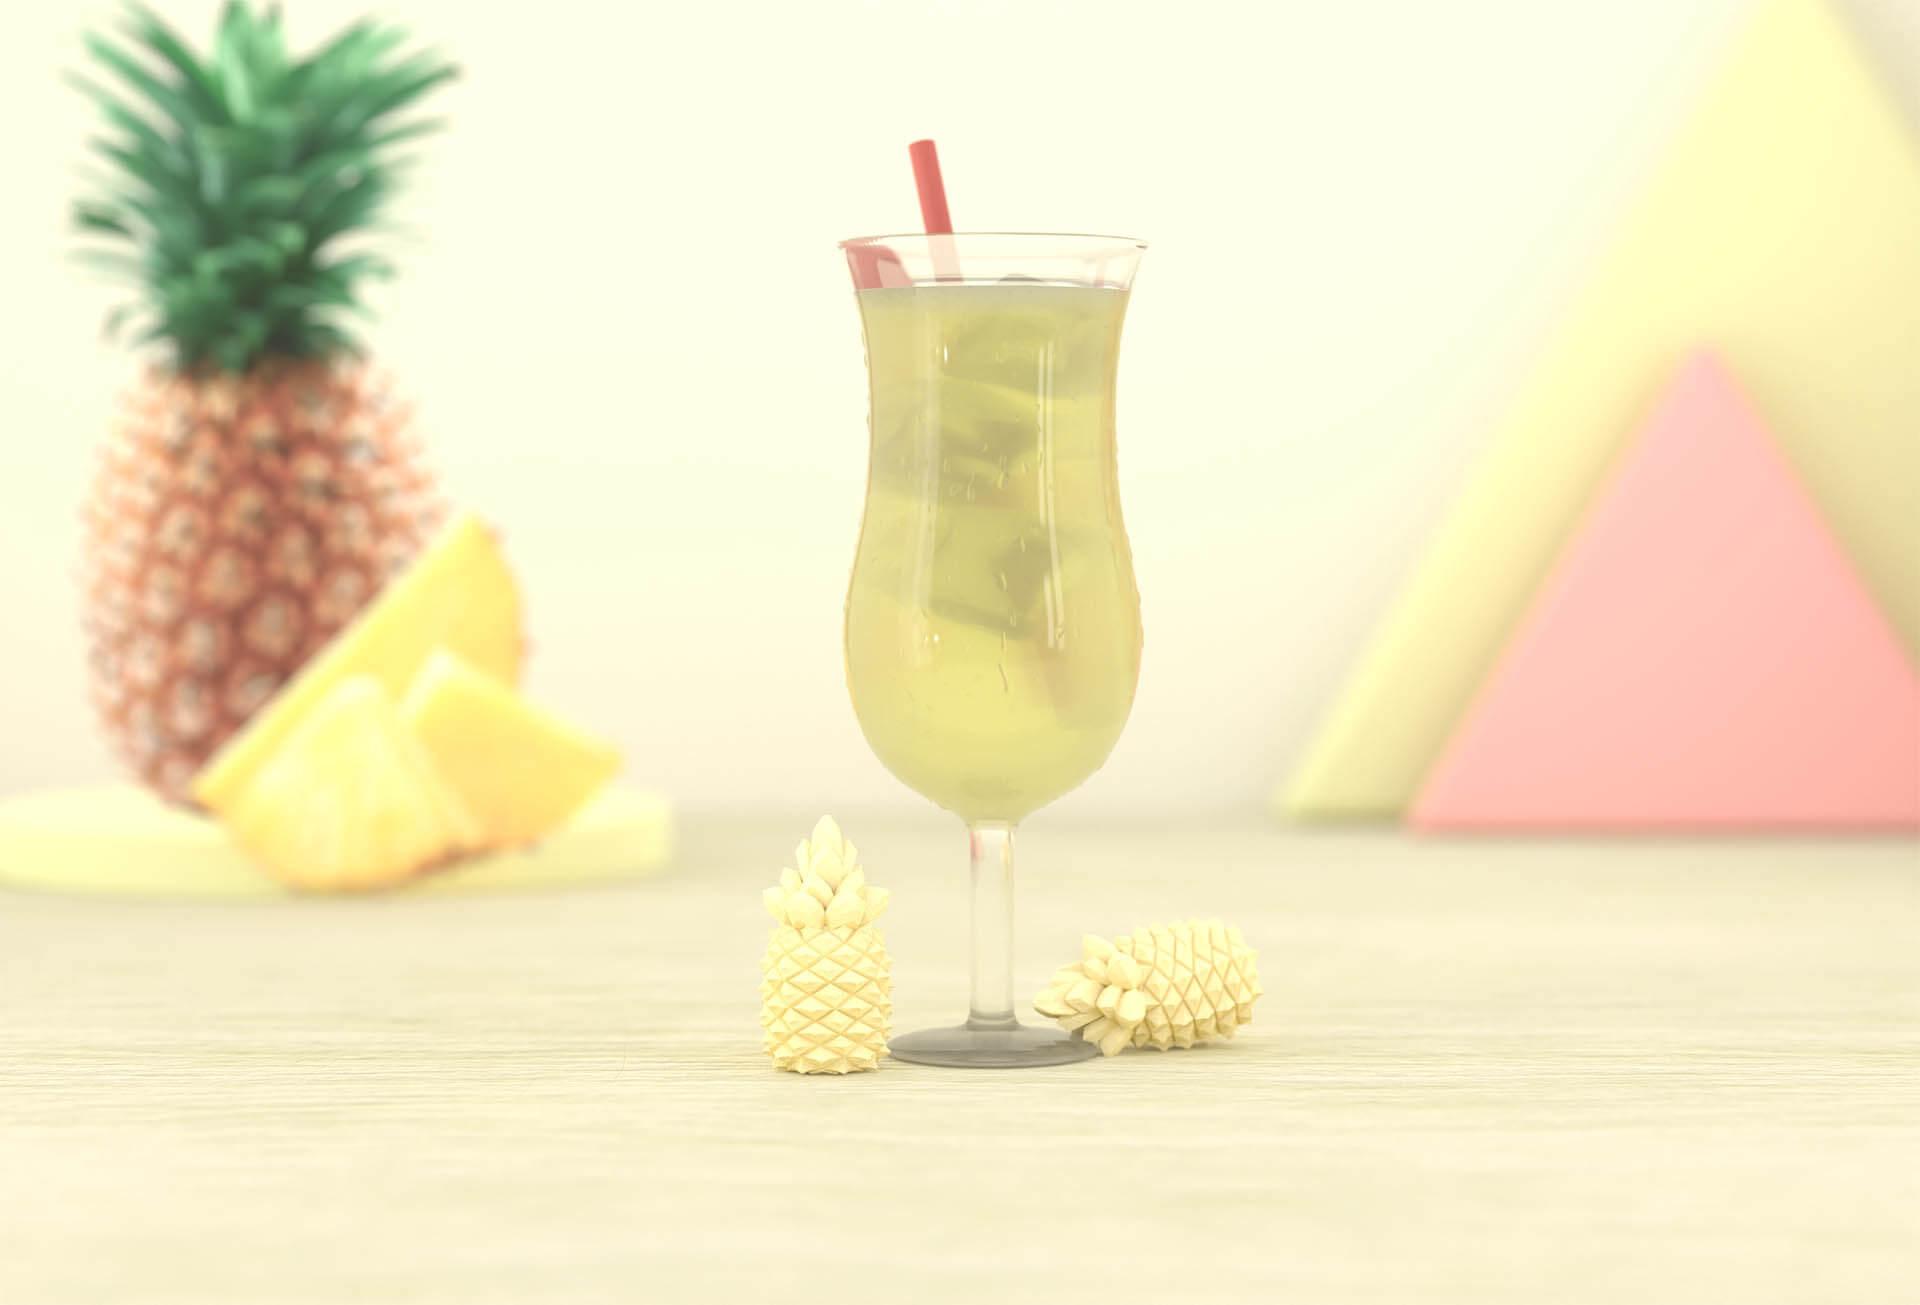 poseidn-3ddrink-3dfood-glassshot-anan-1